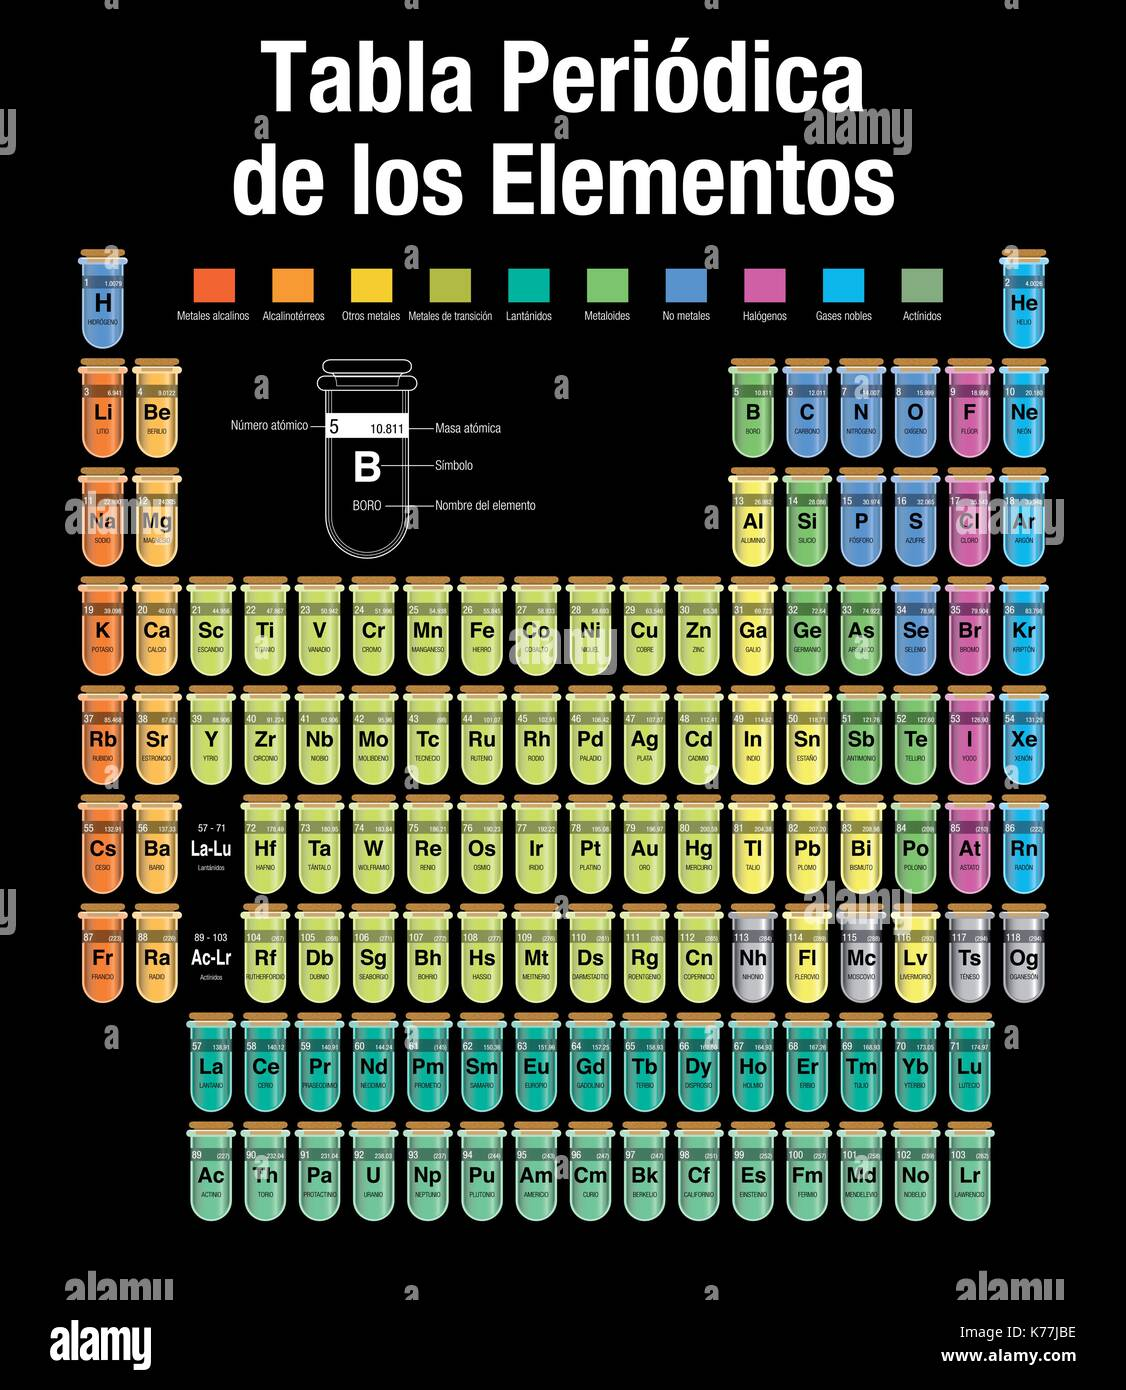 Tabla stock vector images alamy tabla periodica de los elementos periodic table of elements in spanish language consisting of urtaz Choice Image